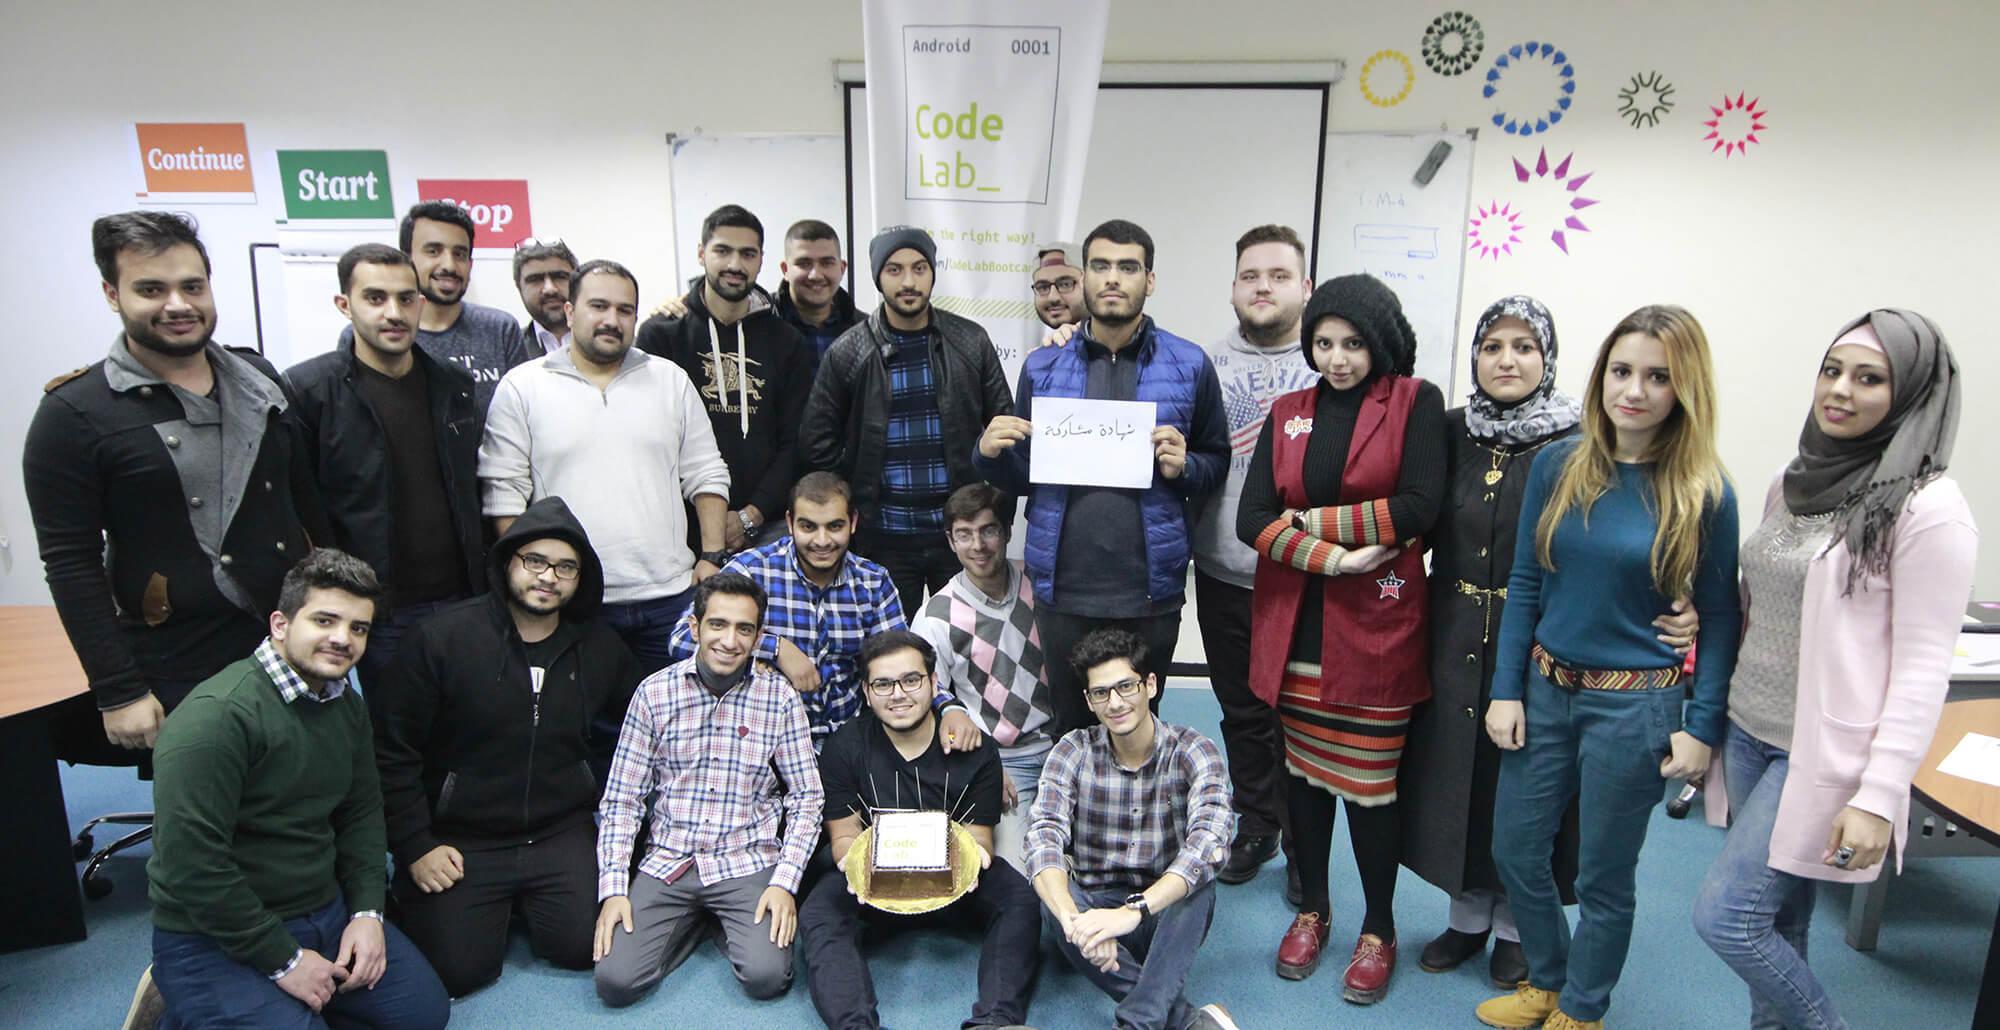 Code Lab, an initiative to close the software developer skill gap in Iraq